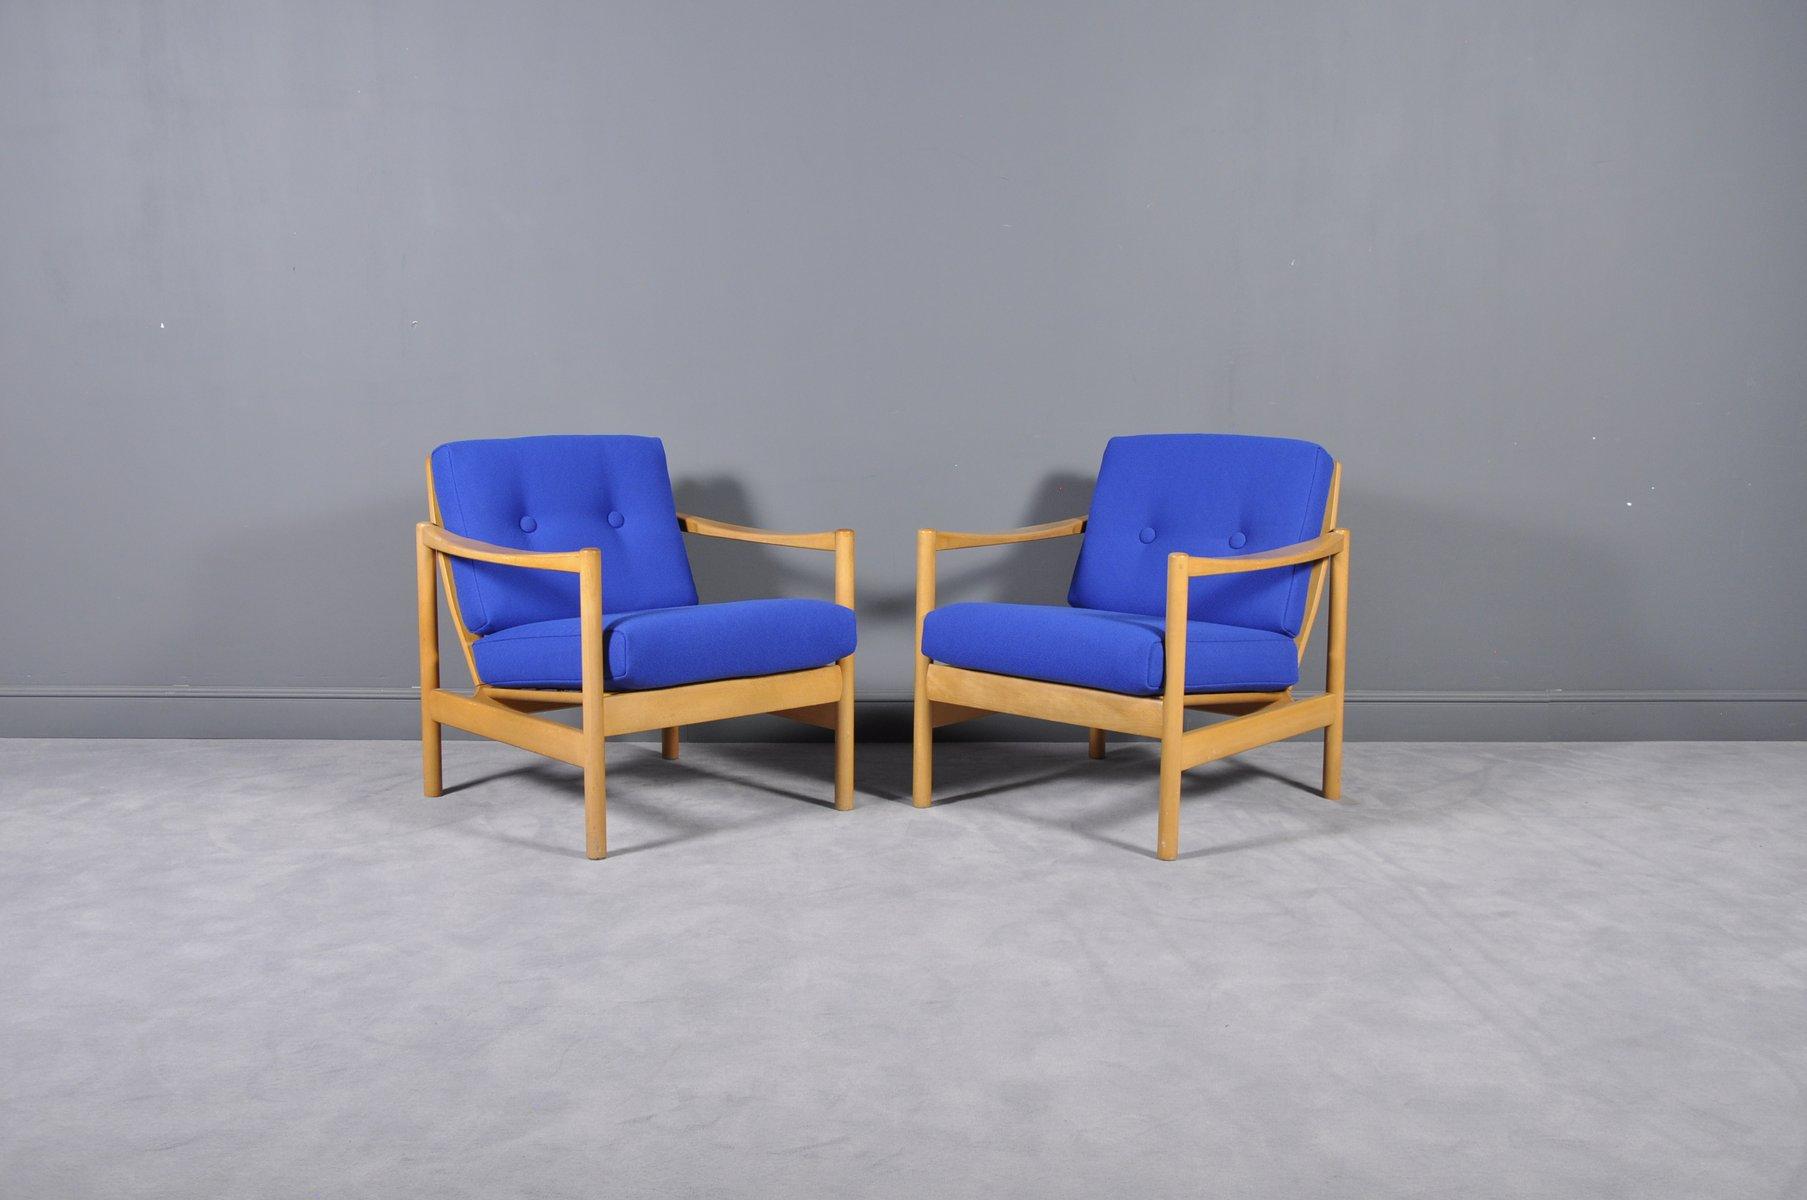 Sessel aus Eiche & Stoff, 1970er, 2er Set